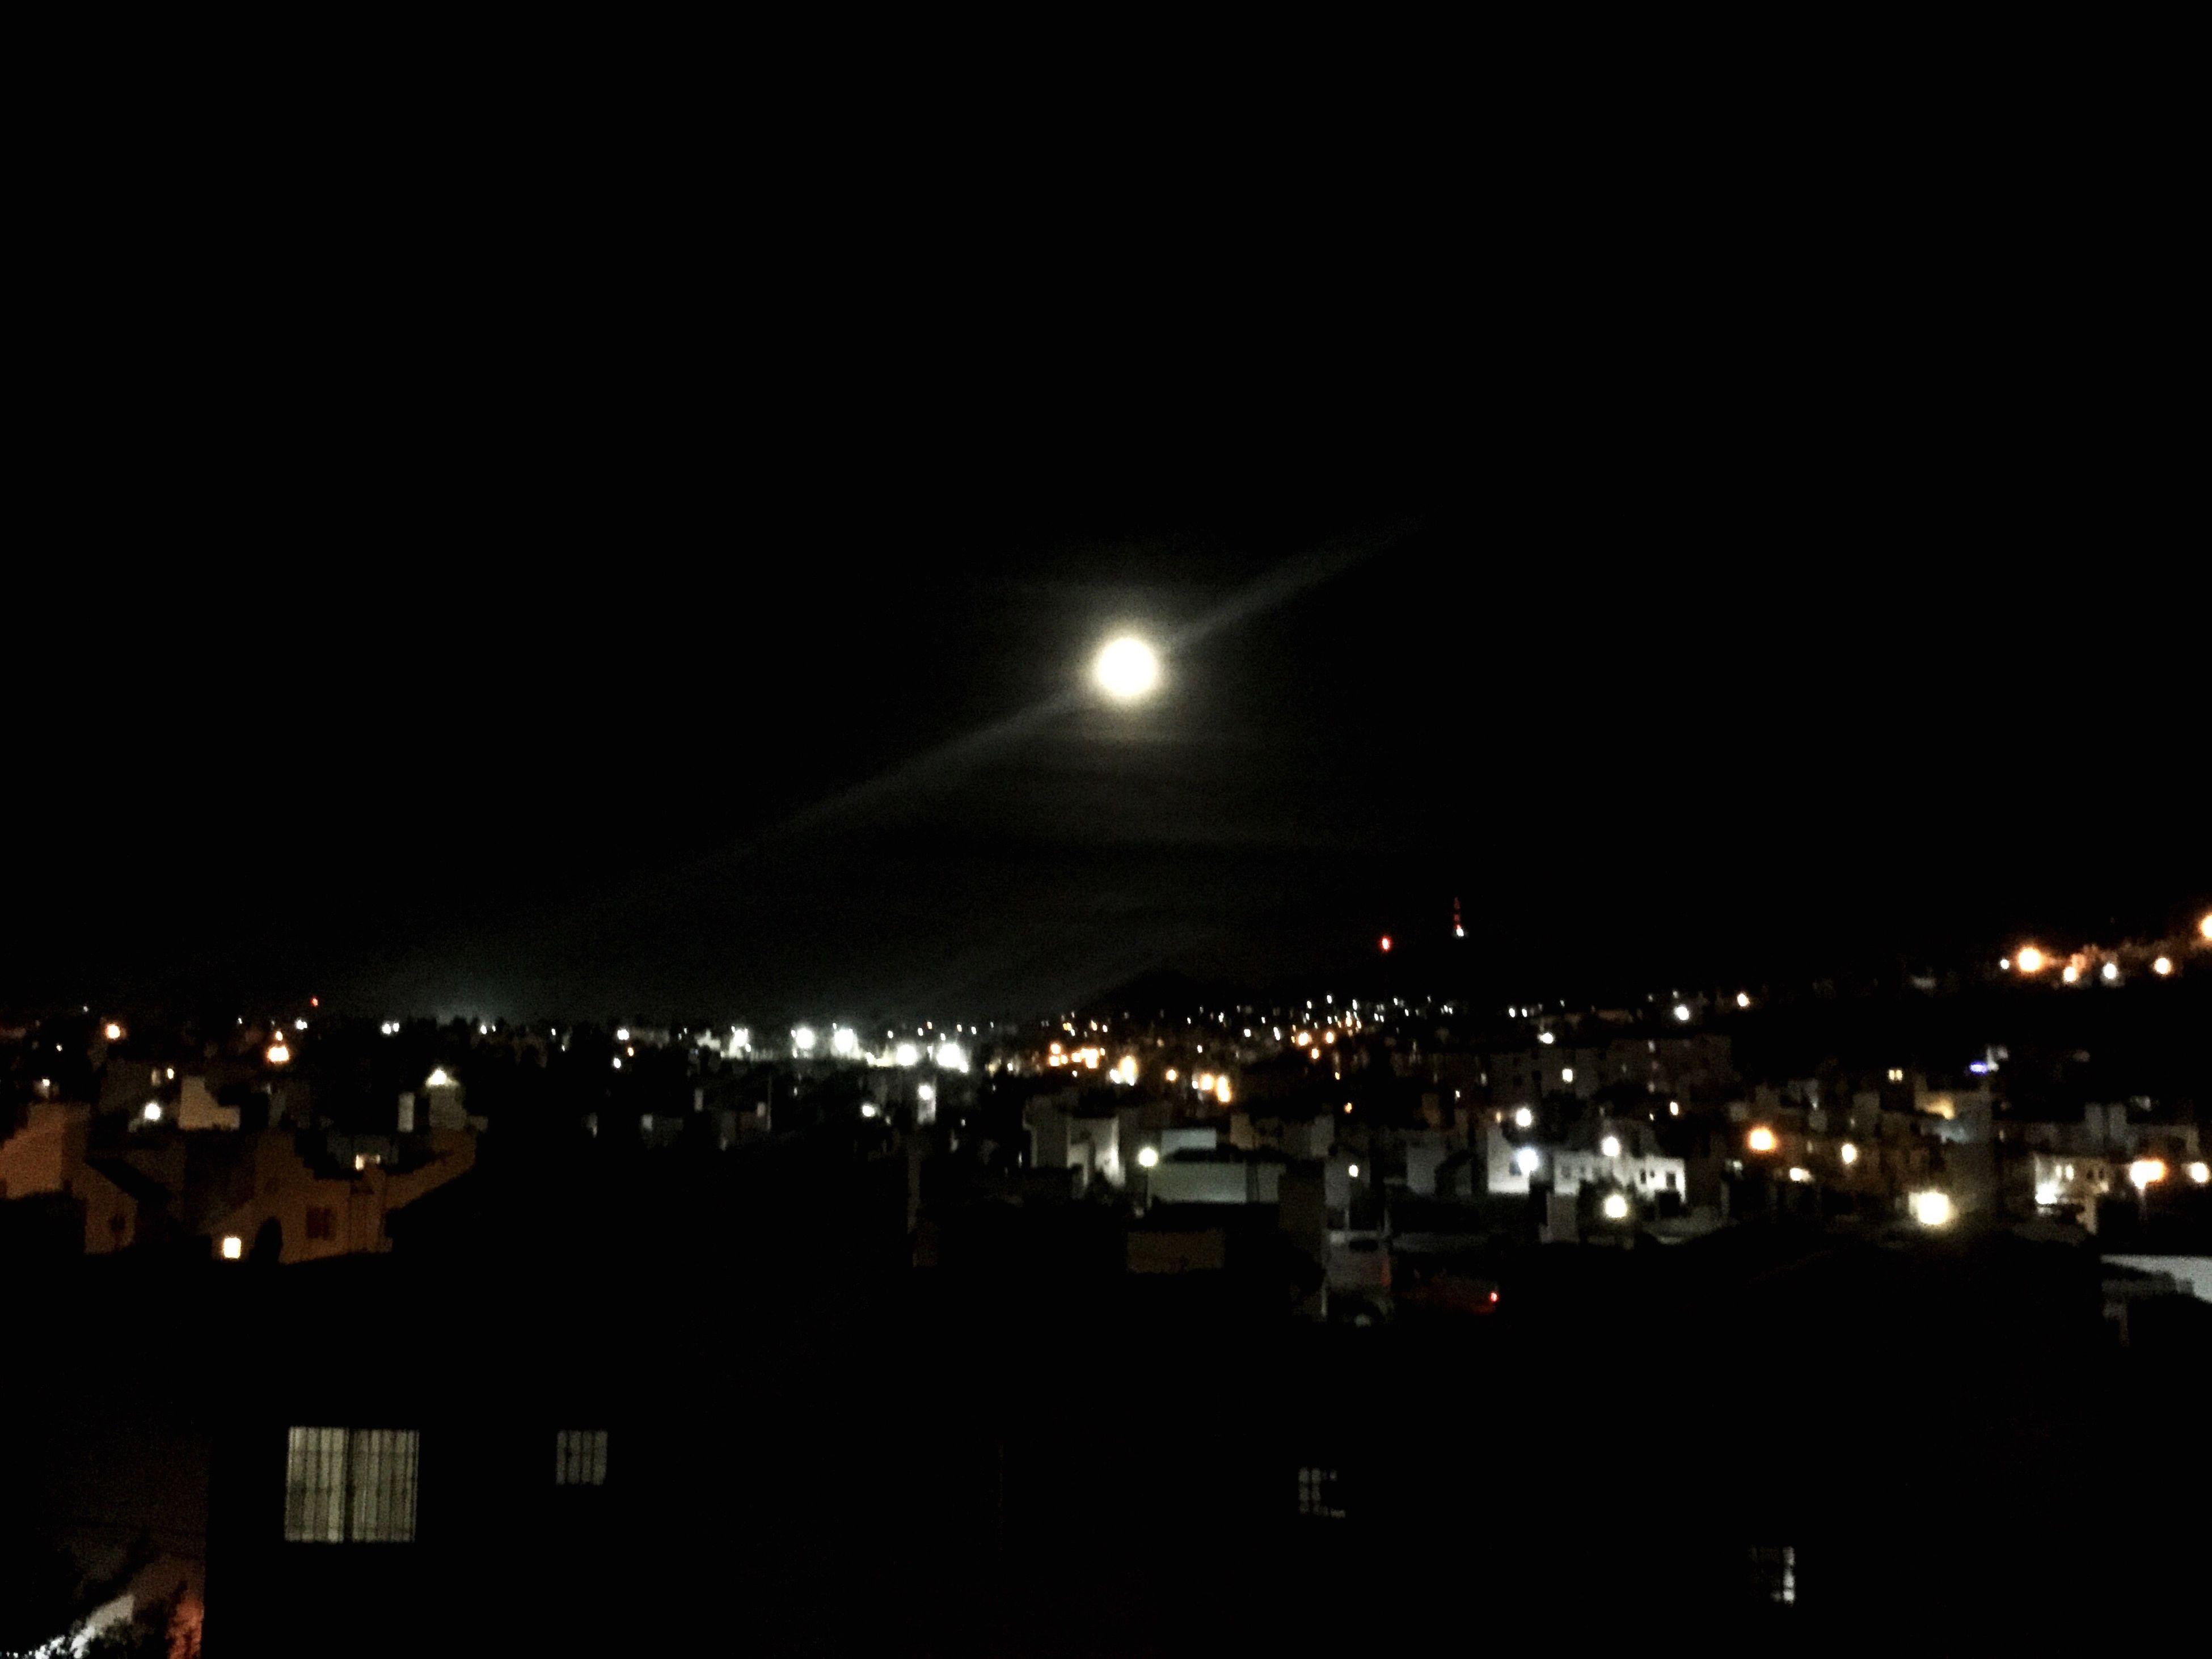 night, illuminated, no people, sky, outdoors, nature, astronomy